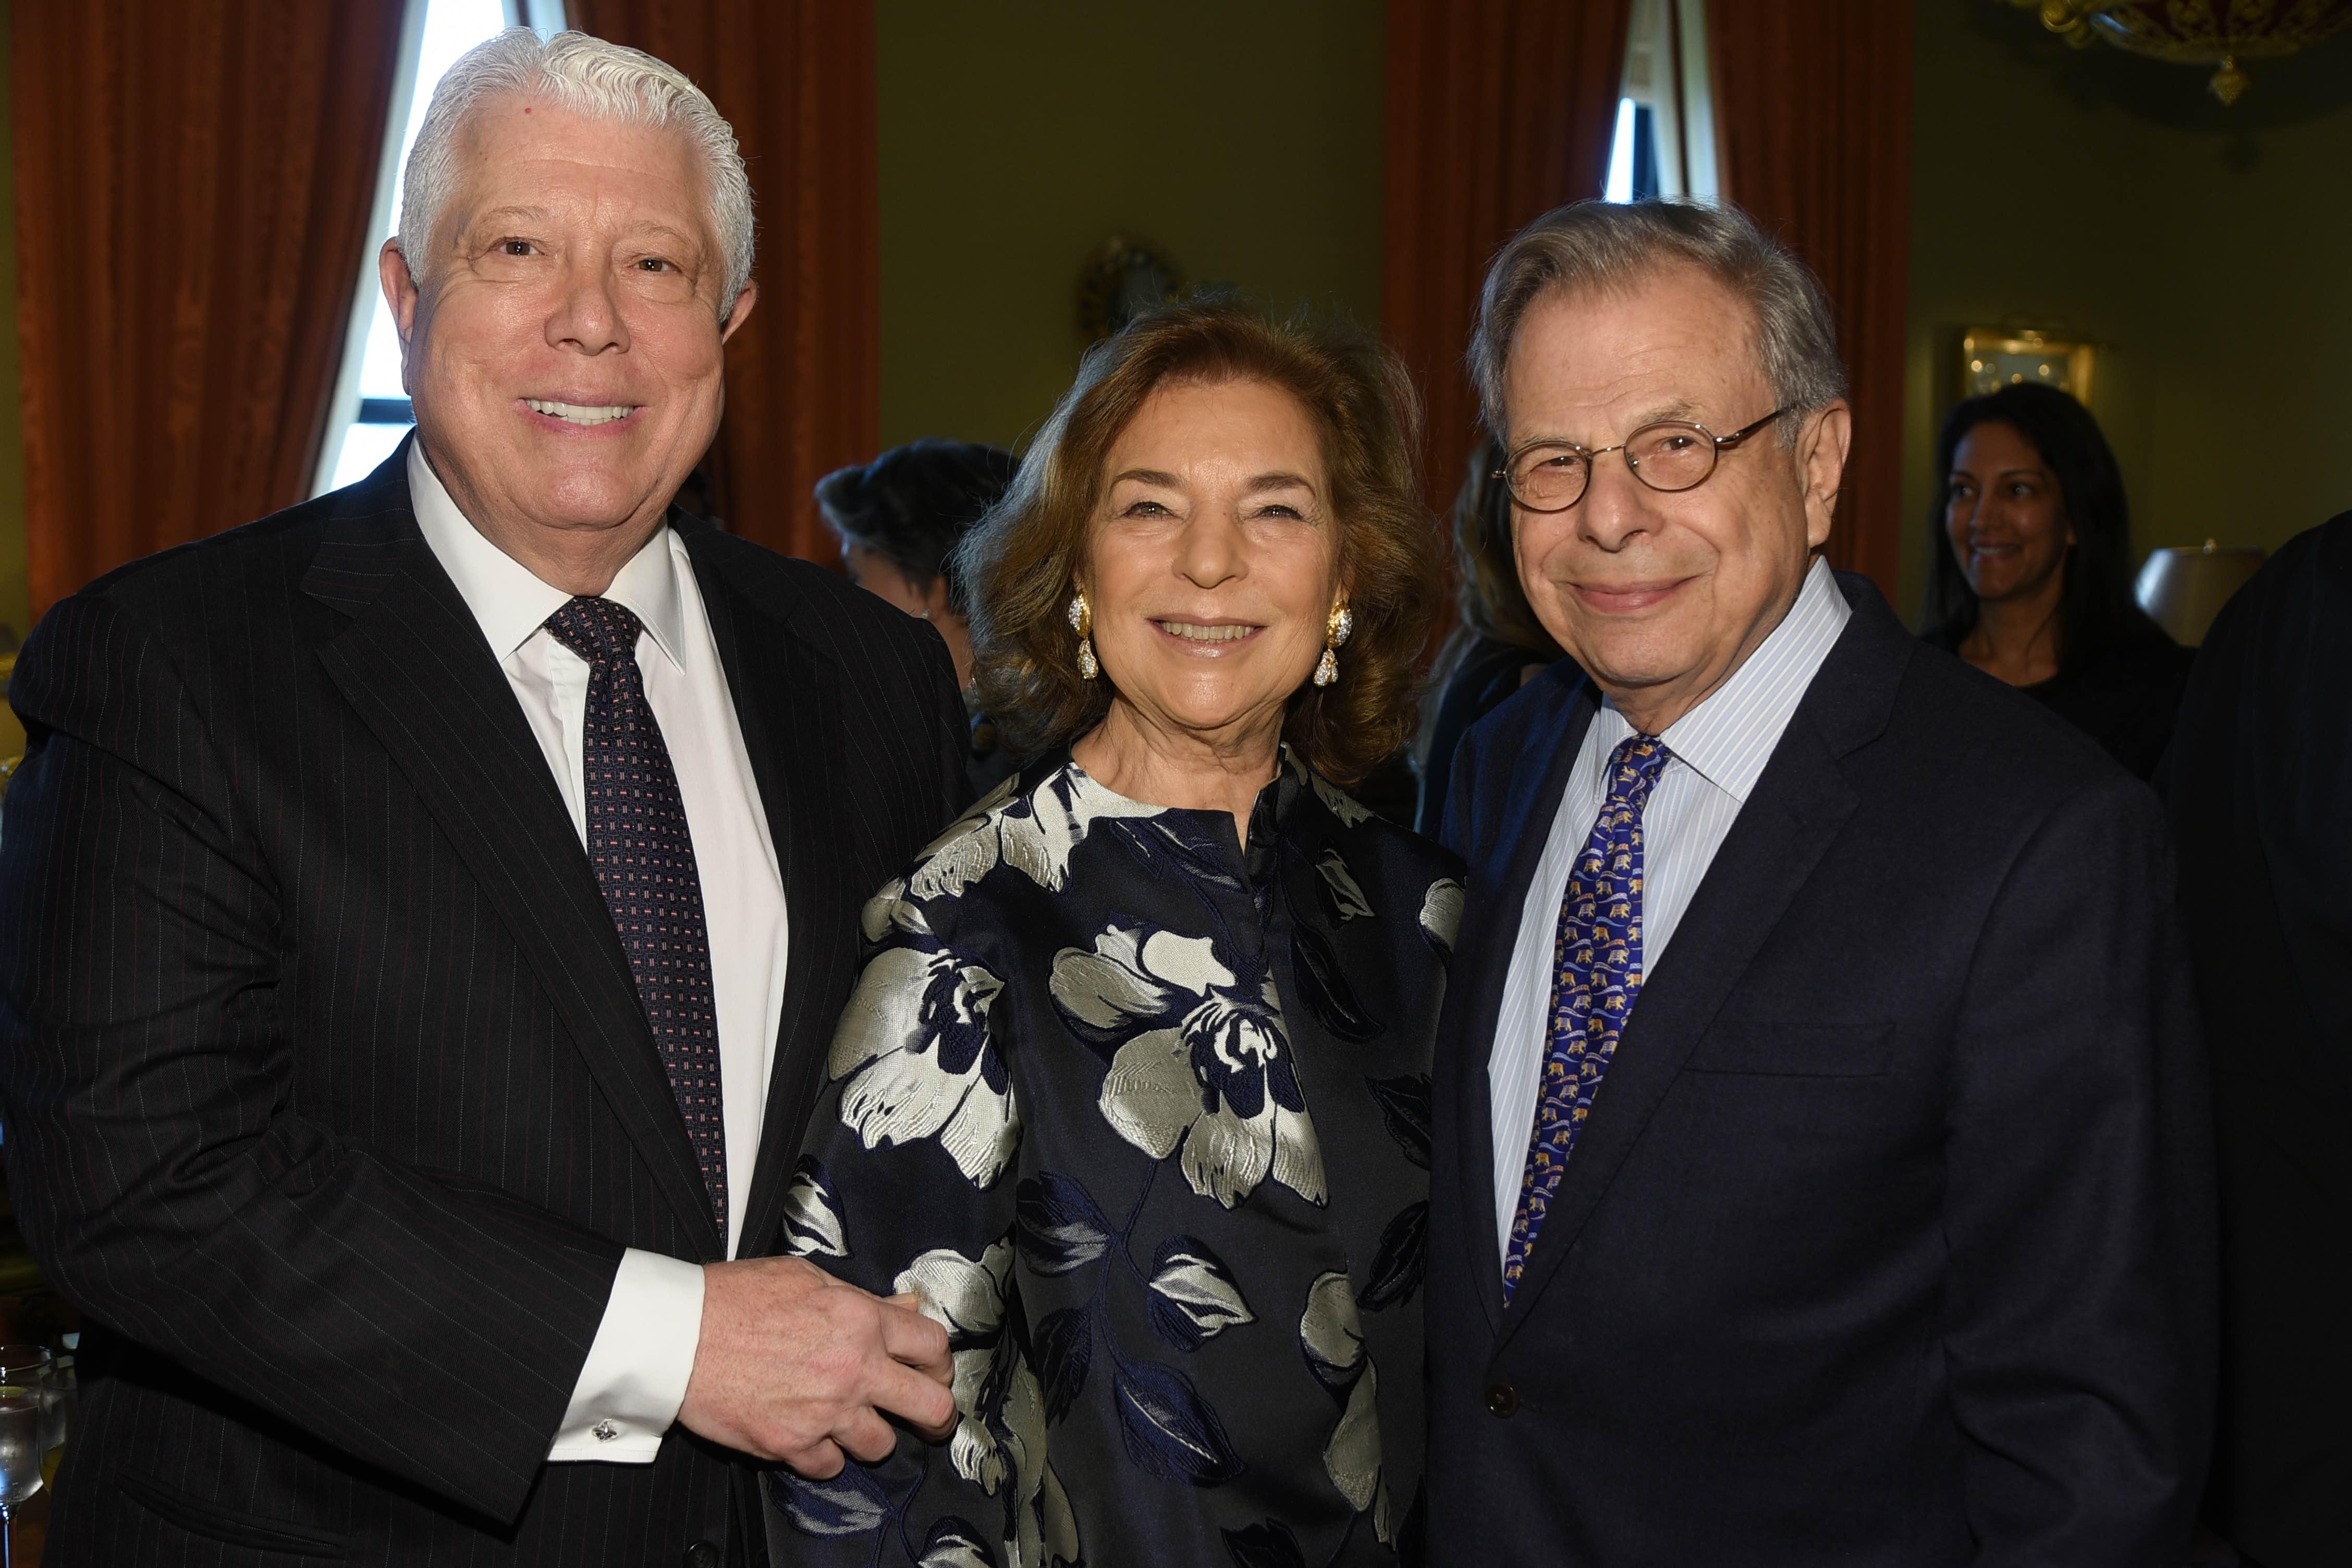 Dennis Basso, Marion Waxman and Dr Samuel Waxman